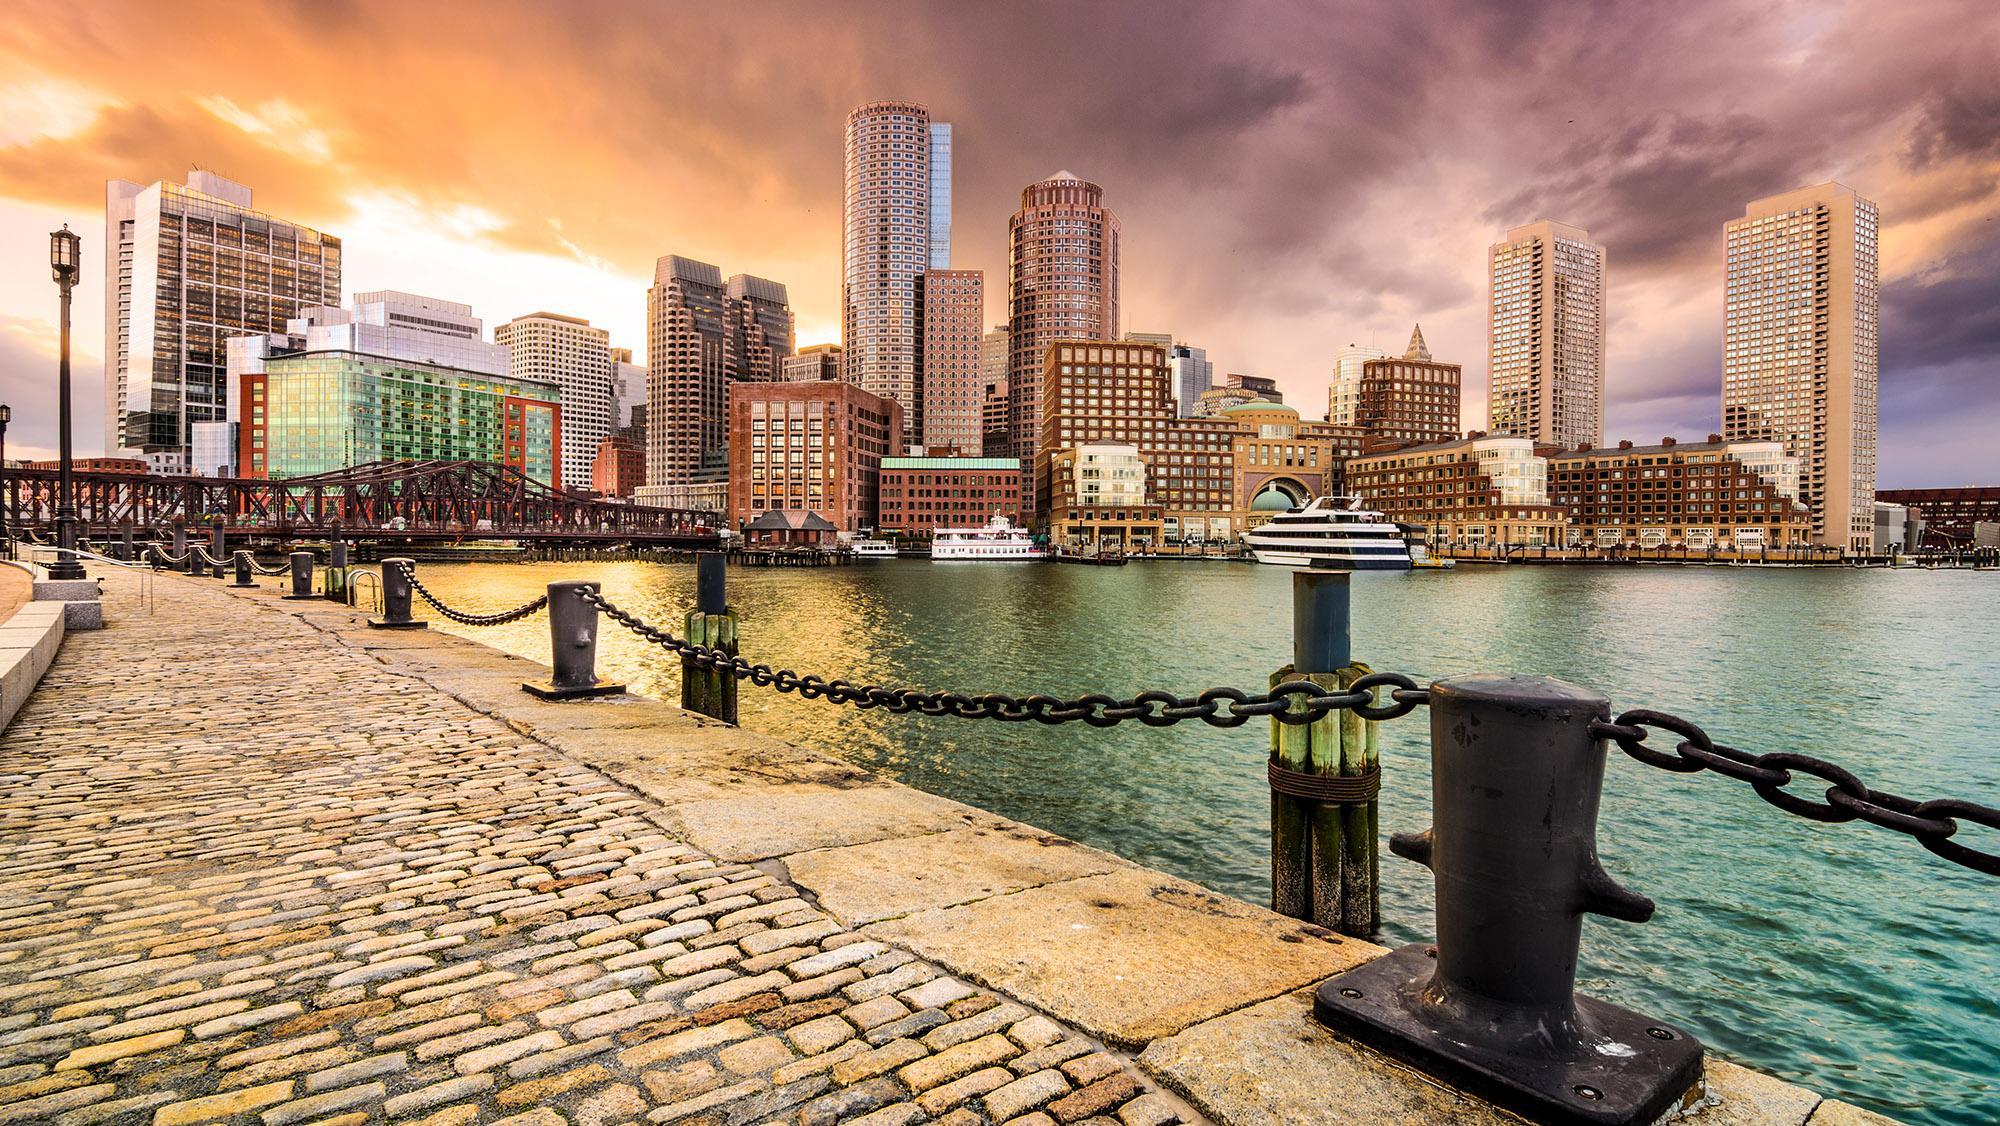 city view of boston, massachusetts